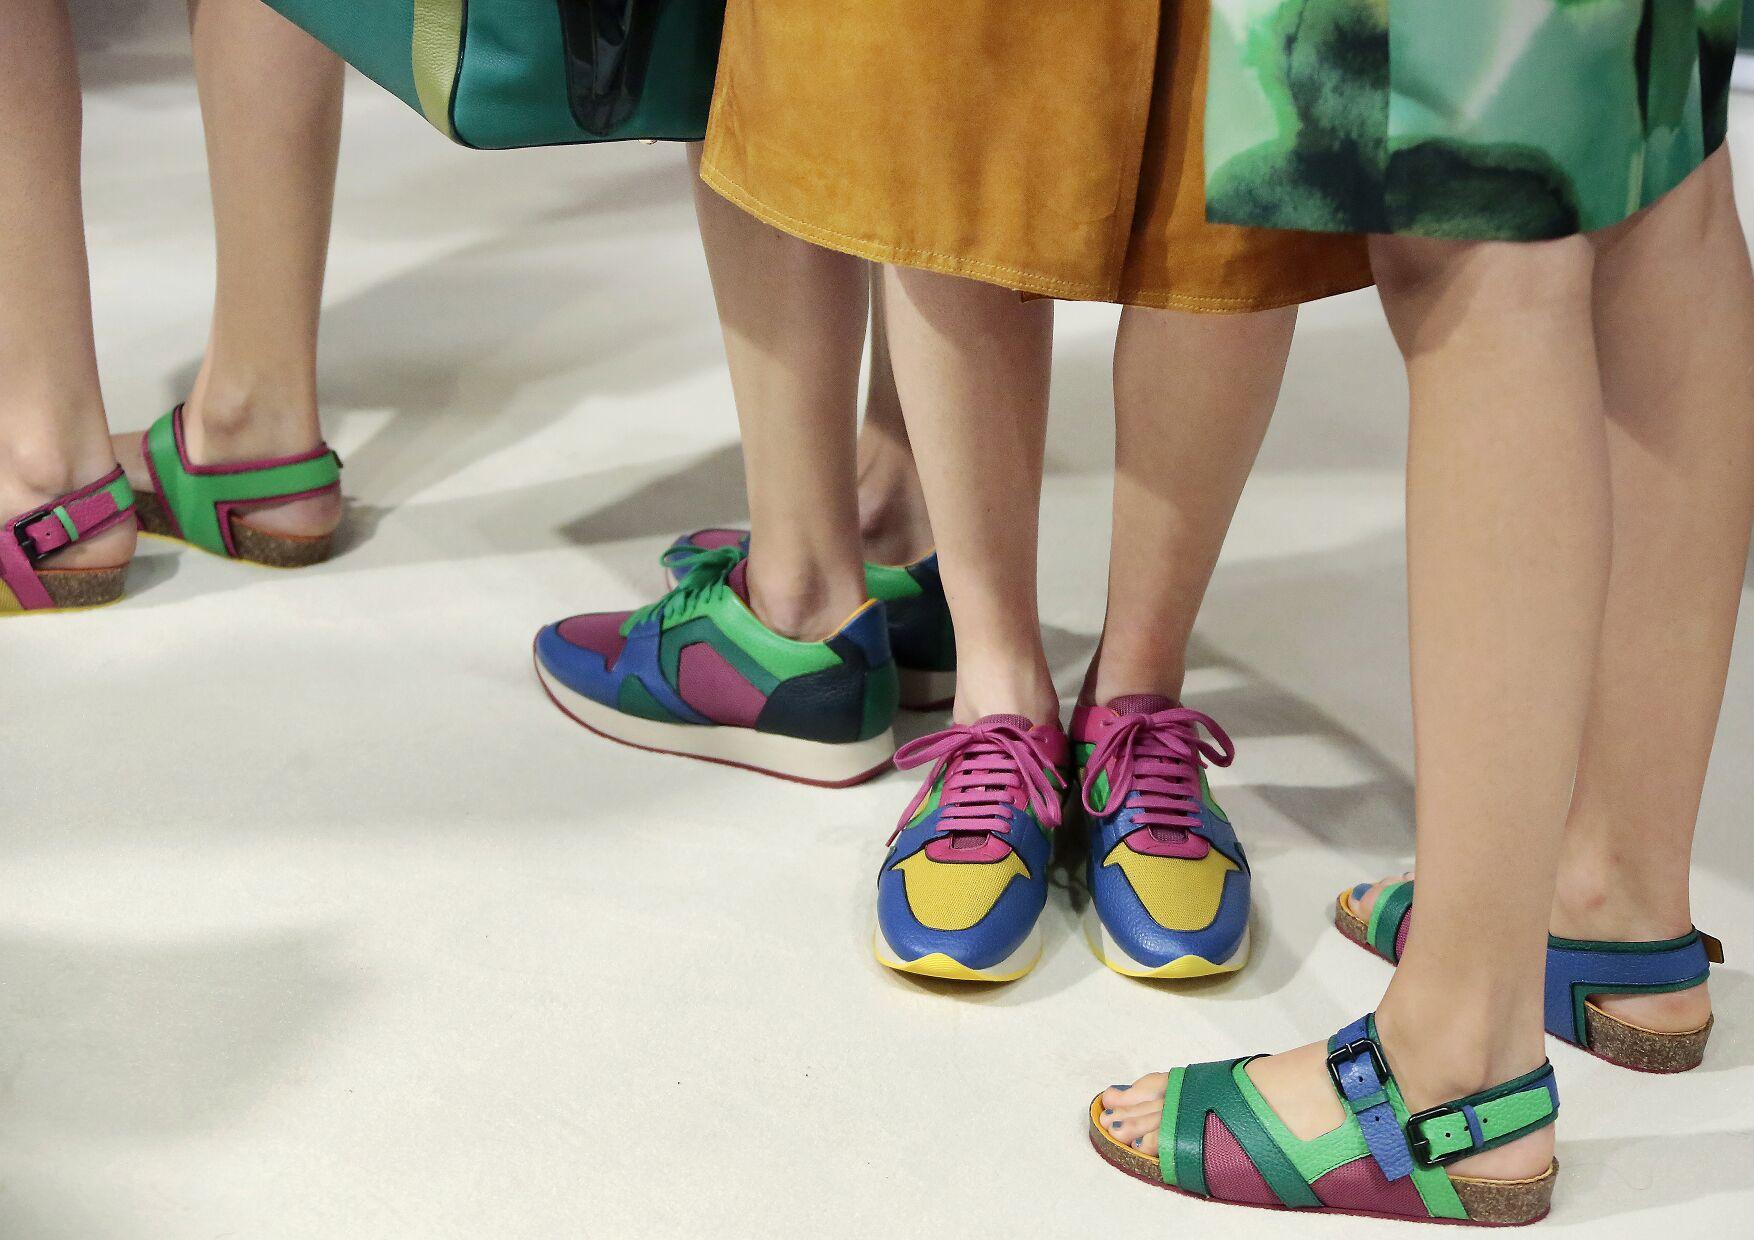 Backstage Burberry Prorsum Shoes